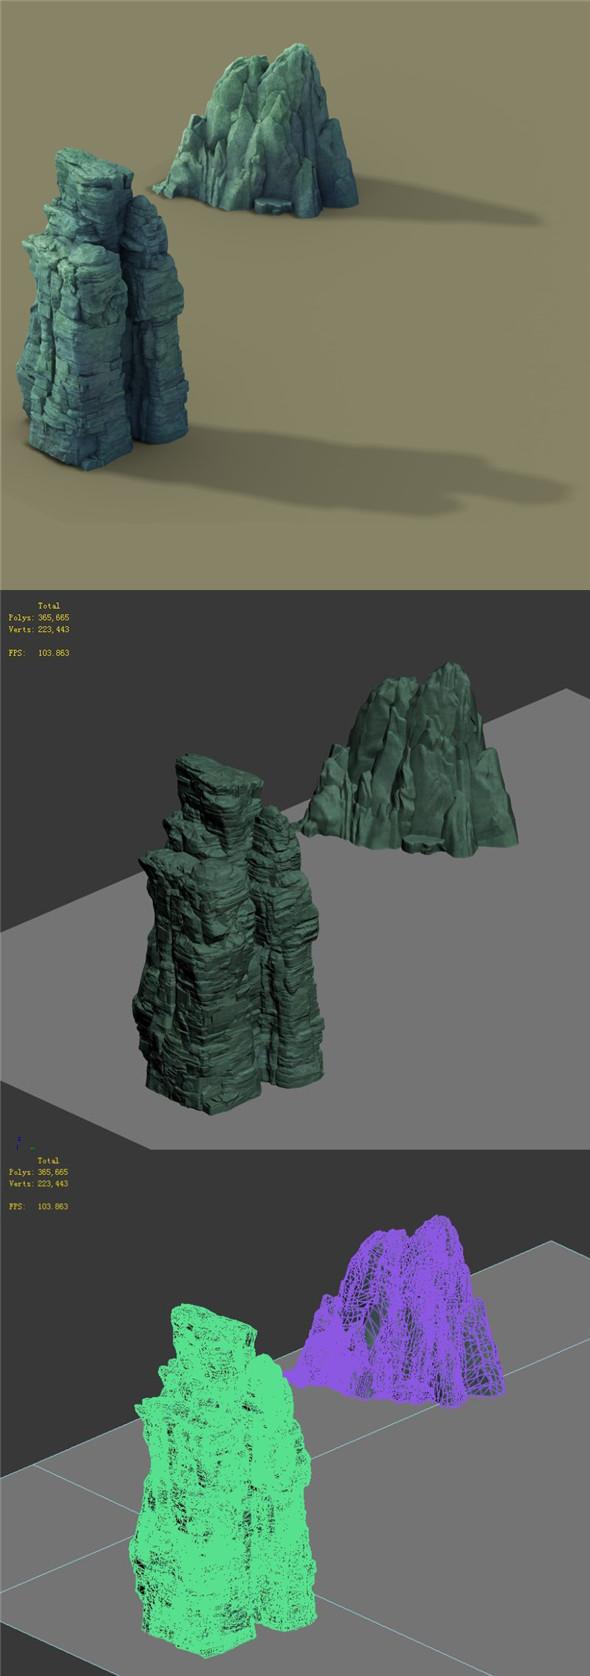 Terrain - Stone 02 - 3DOcean Item for Sale